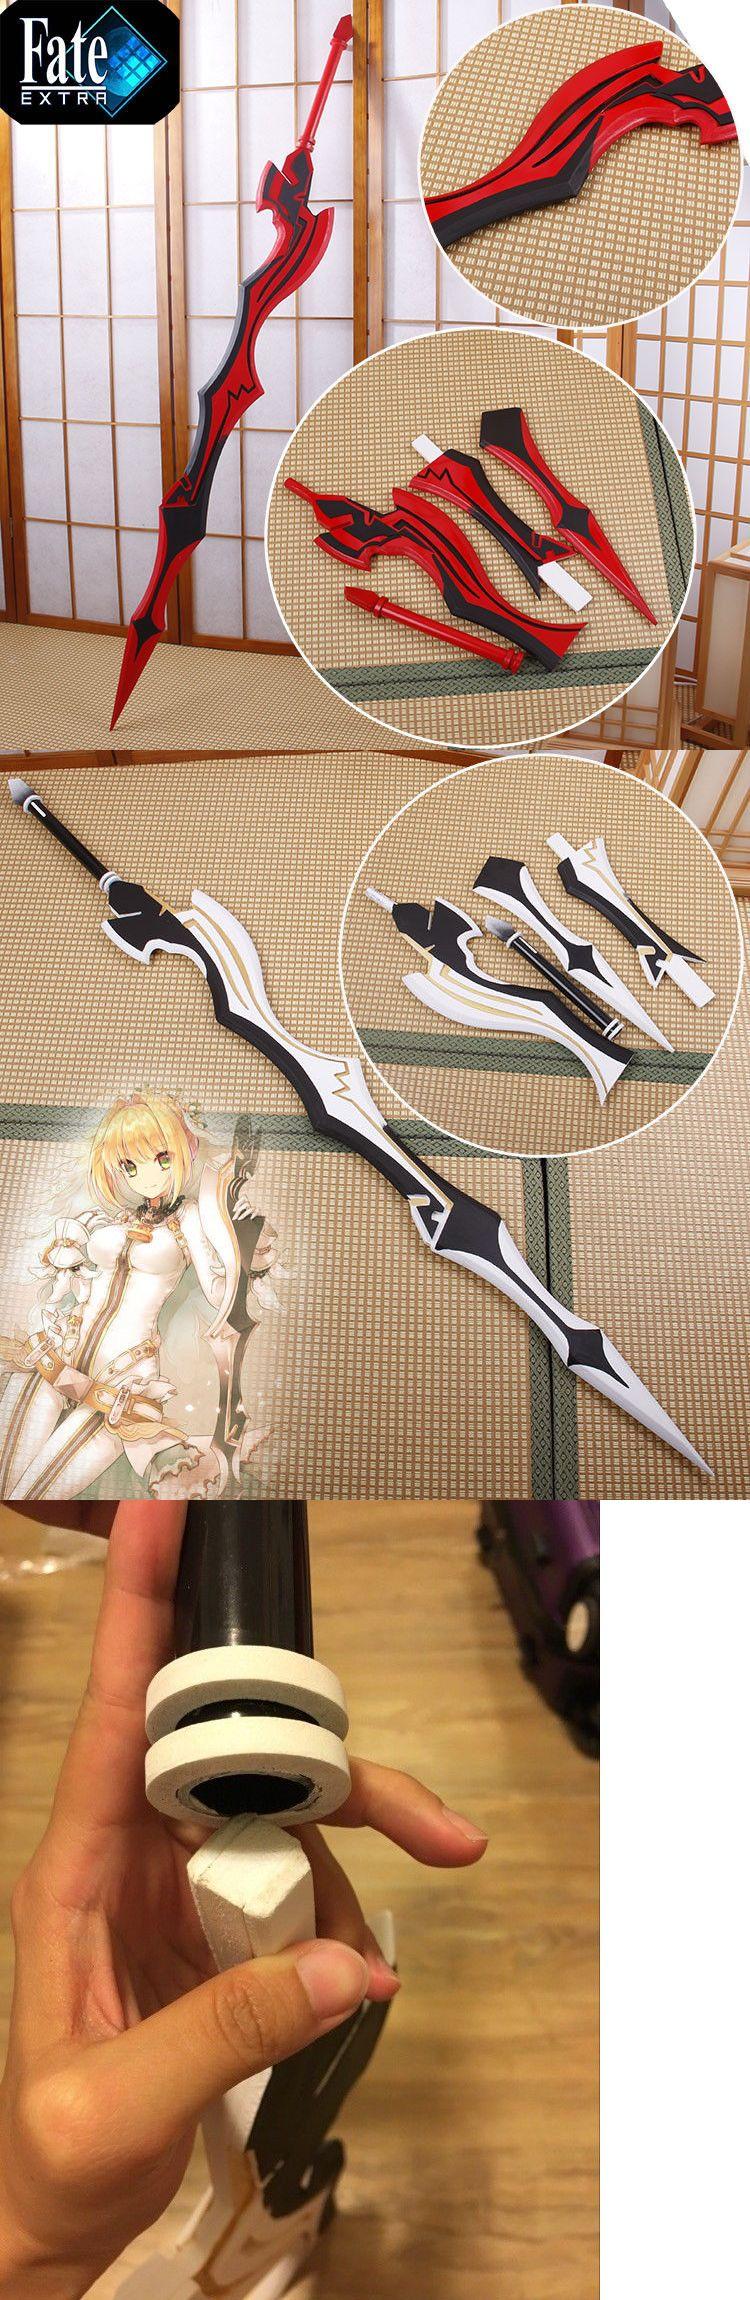 "Fate Zero Extra Saber Nero Aestus Estus White Red Sword Anime Cosplay Prop 63/"""